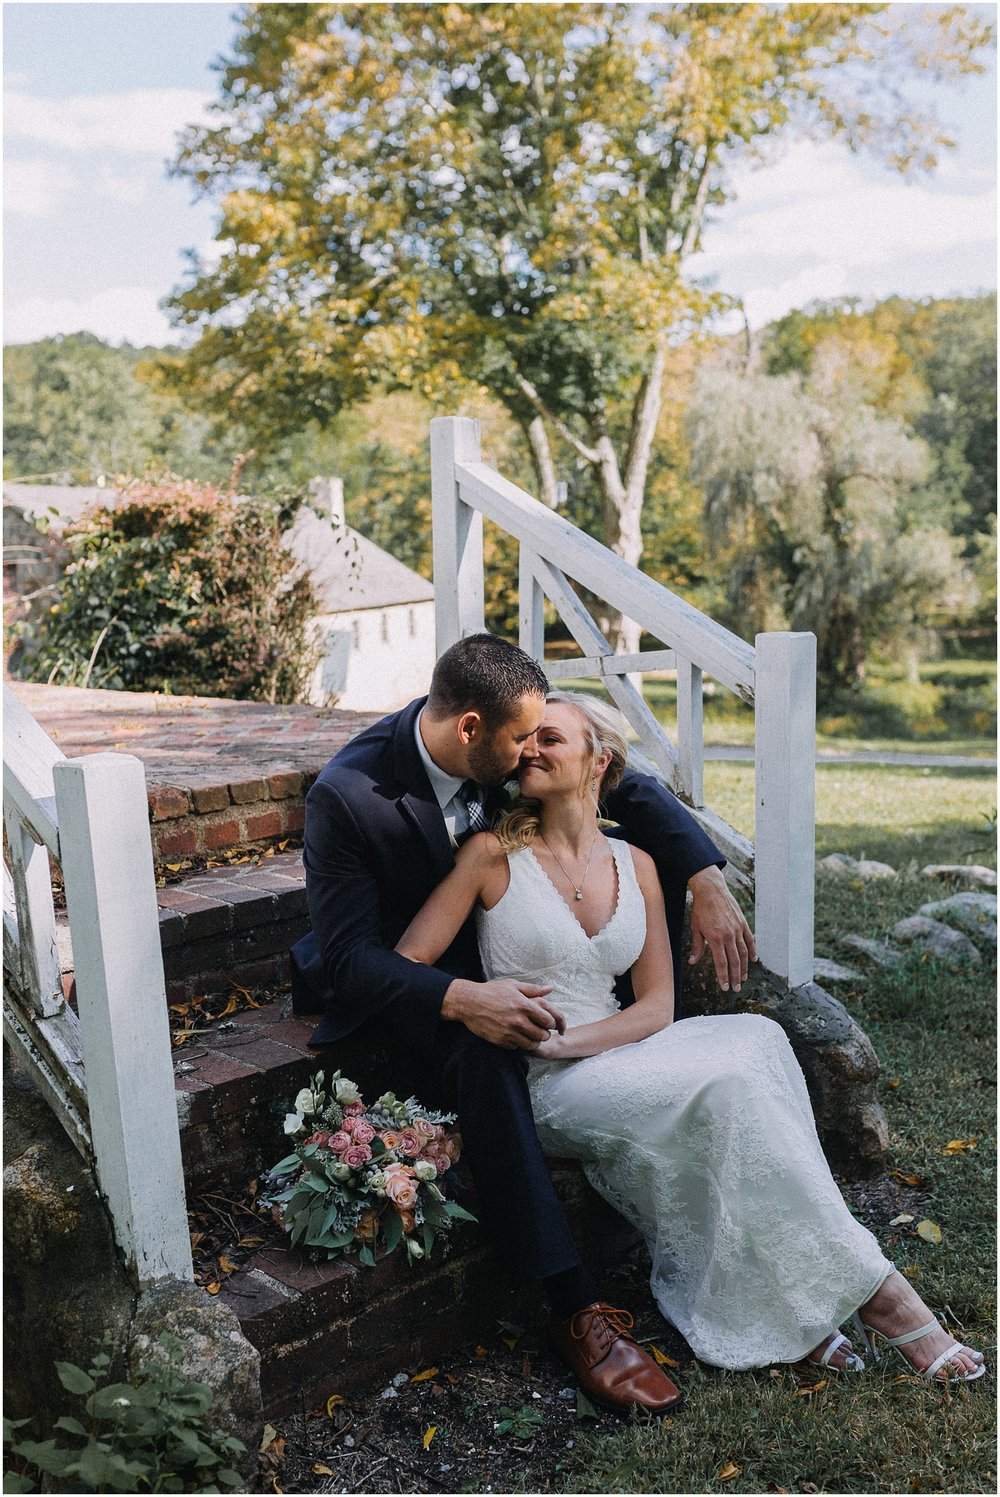 waterloo-village-waterloo village-wedding-outdoor wedding-rustic-boemian-new jersey-bride-groom-wedding party-davids bridal-wedding dress-wedding-first kiss-intimate wedding_0367.jpg